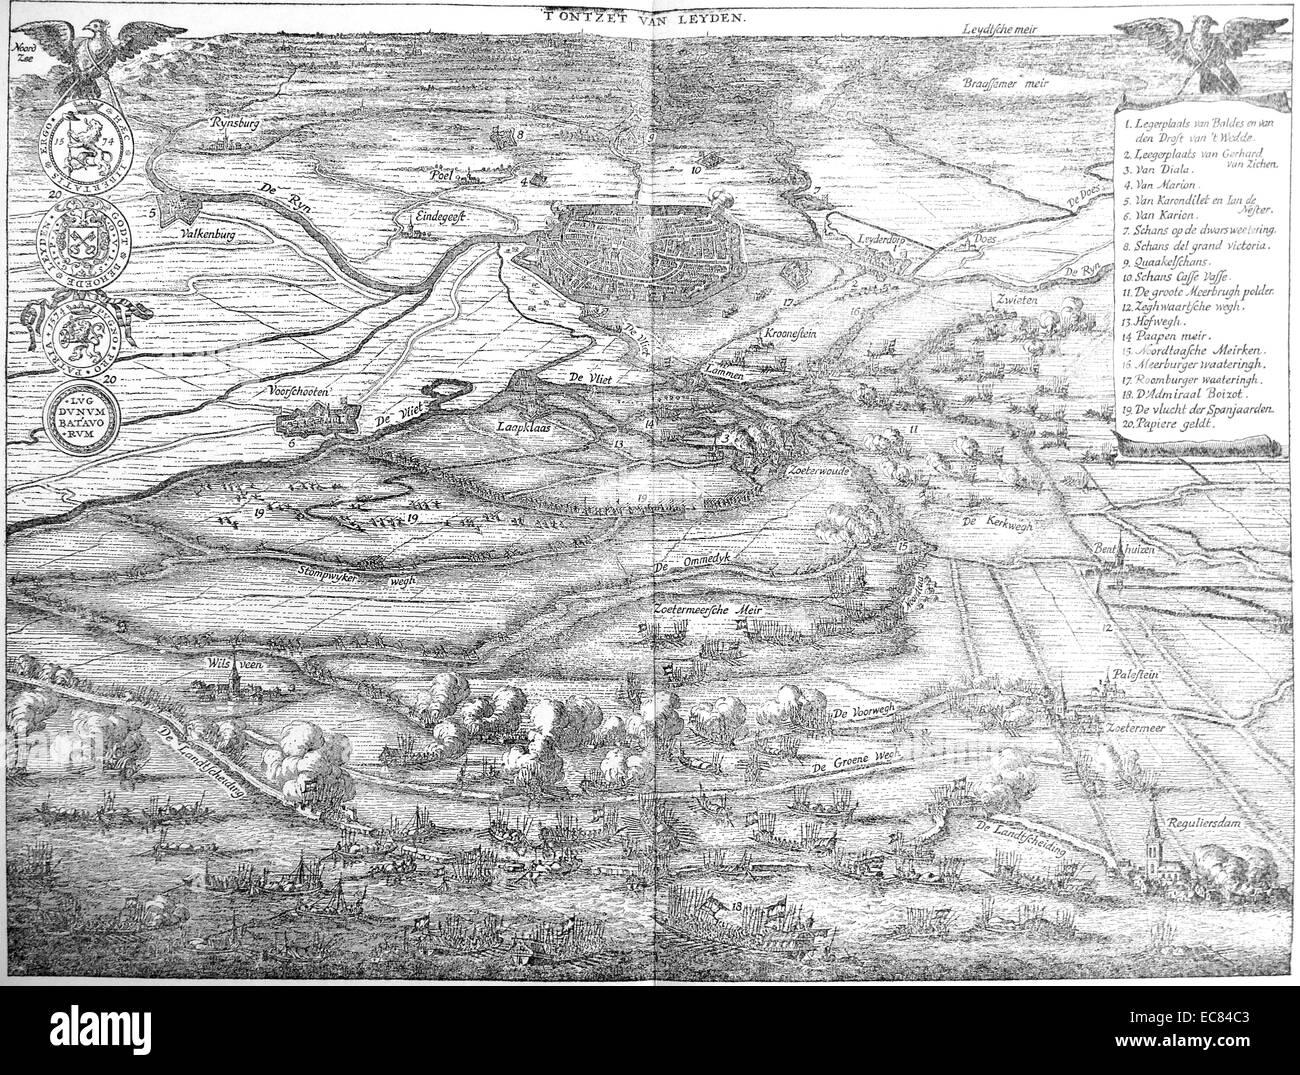 The Siege of Leiden 1574 - Stock Image